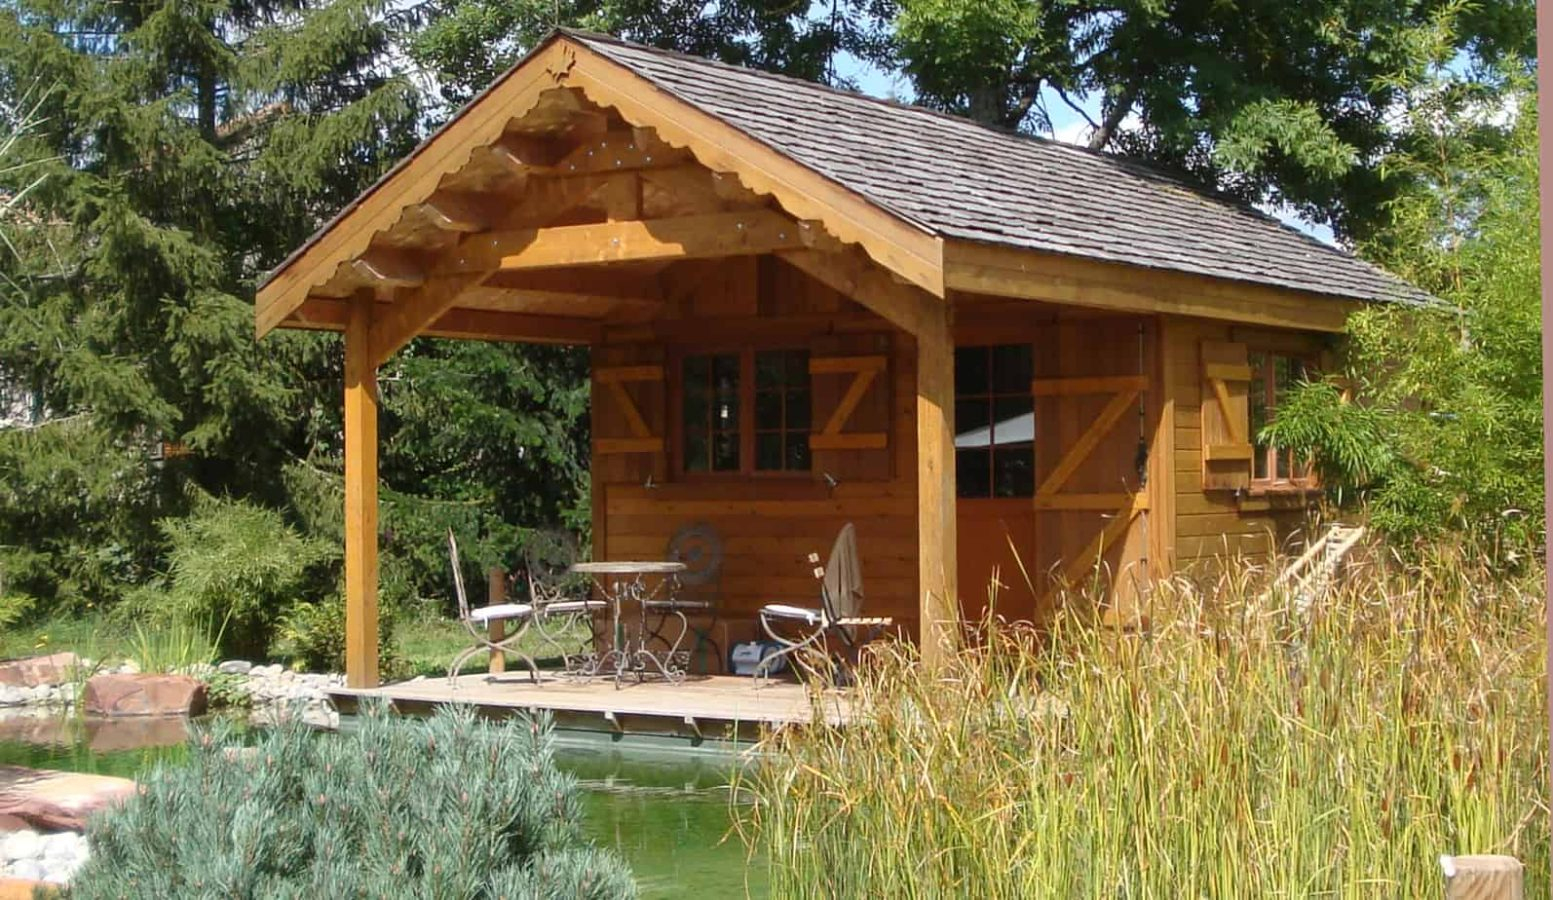 Abri De Jardin Sur Mesure - Batievsen concernant Abri De Jardin France